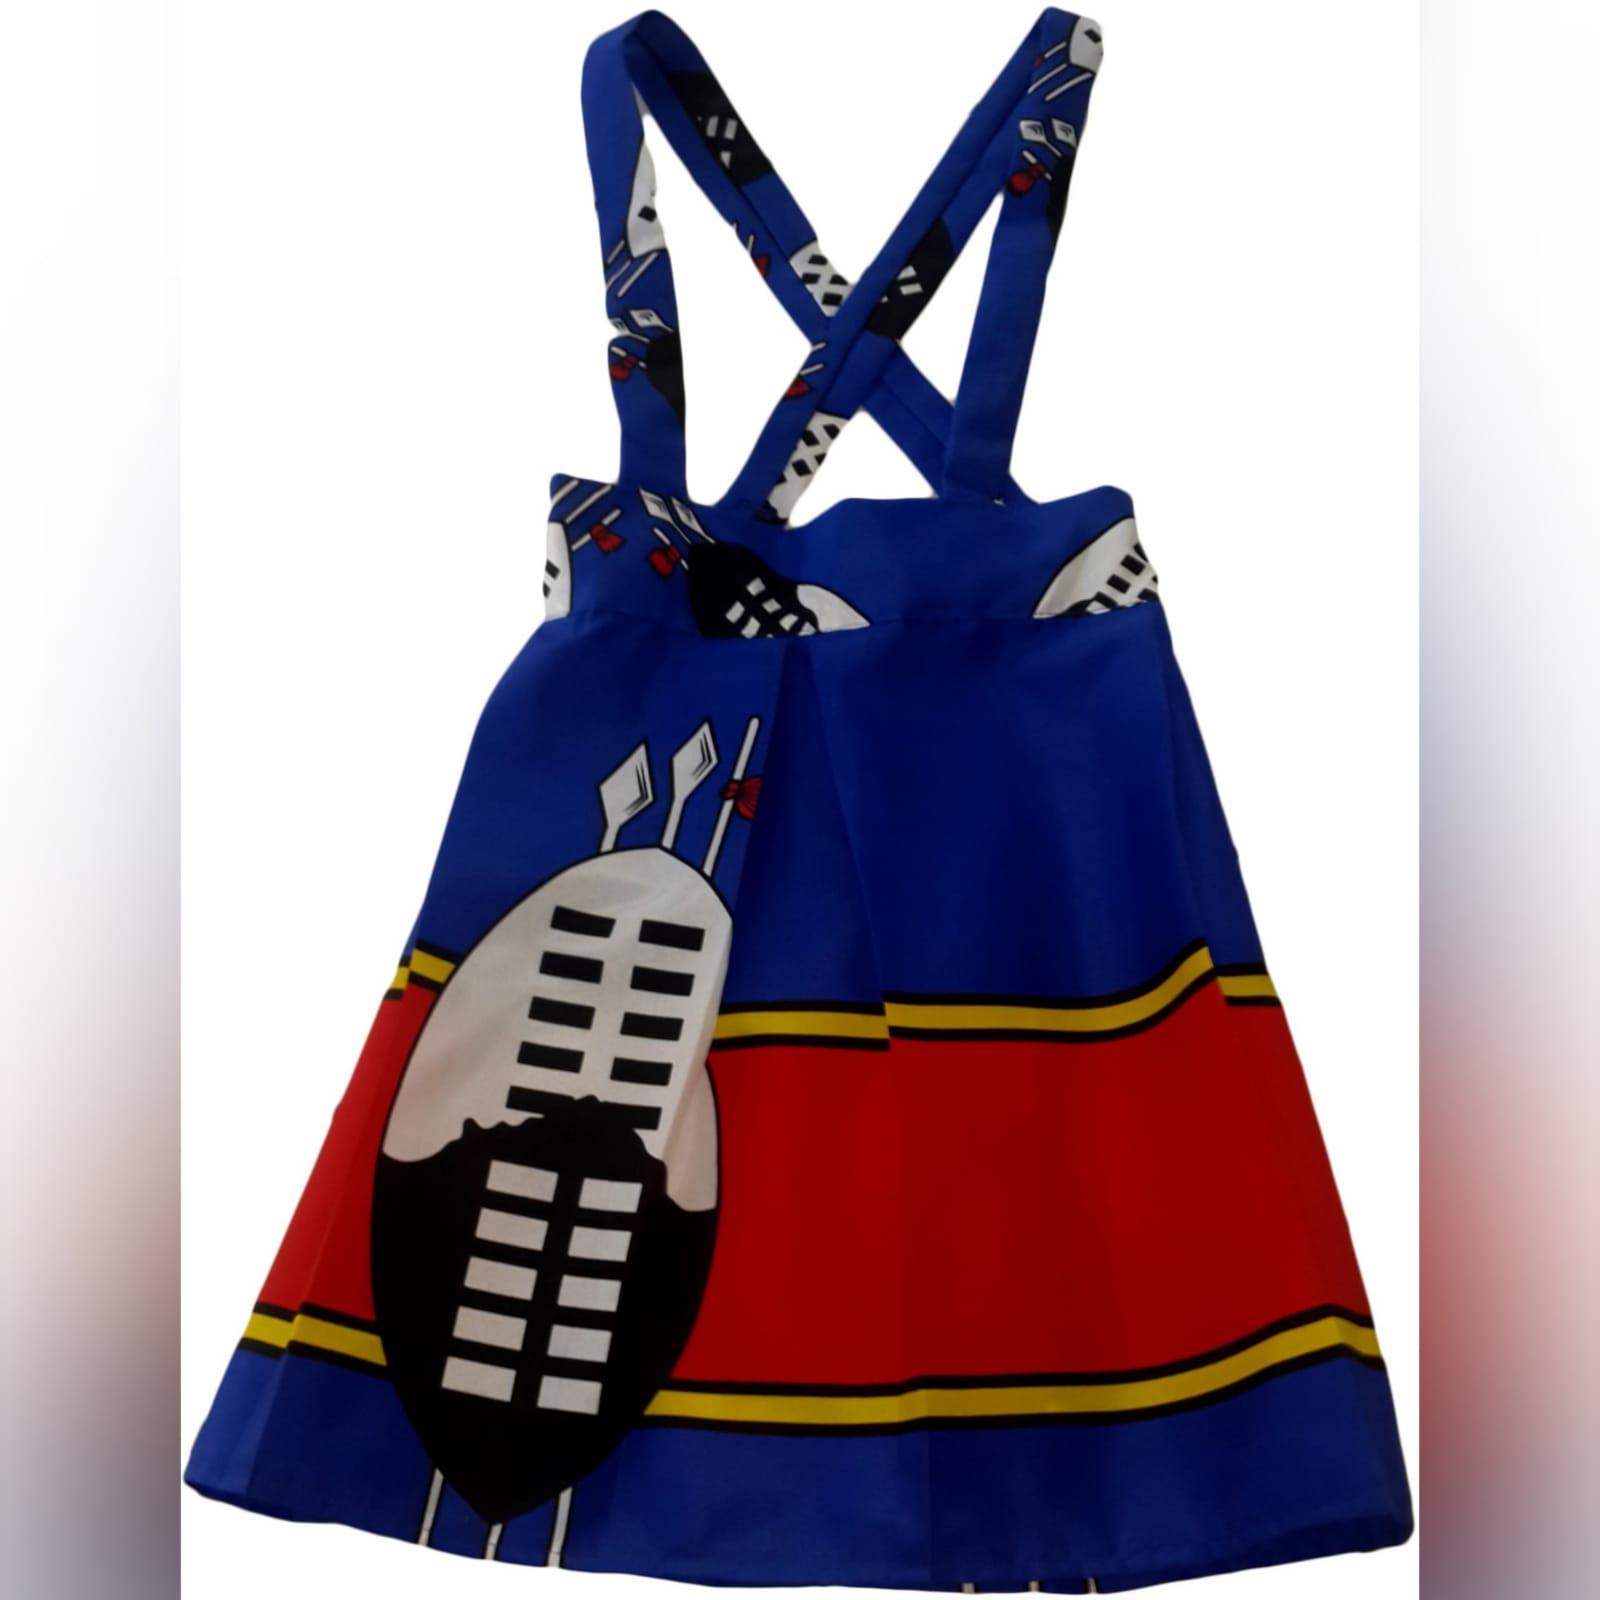 Swati traditional wedding attire 5 mens swazi/swati short sleeve shirt. High waisted swazi/swati skirt. High waisted pleated swazi/swati skirt with crossed shoulder straps. One sleeve little girls swazi/swati dress with shoulder strap. Traditional wedding attire